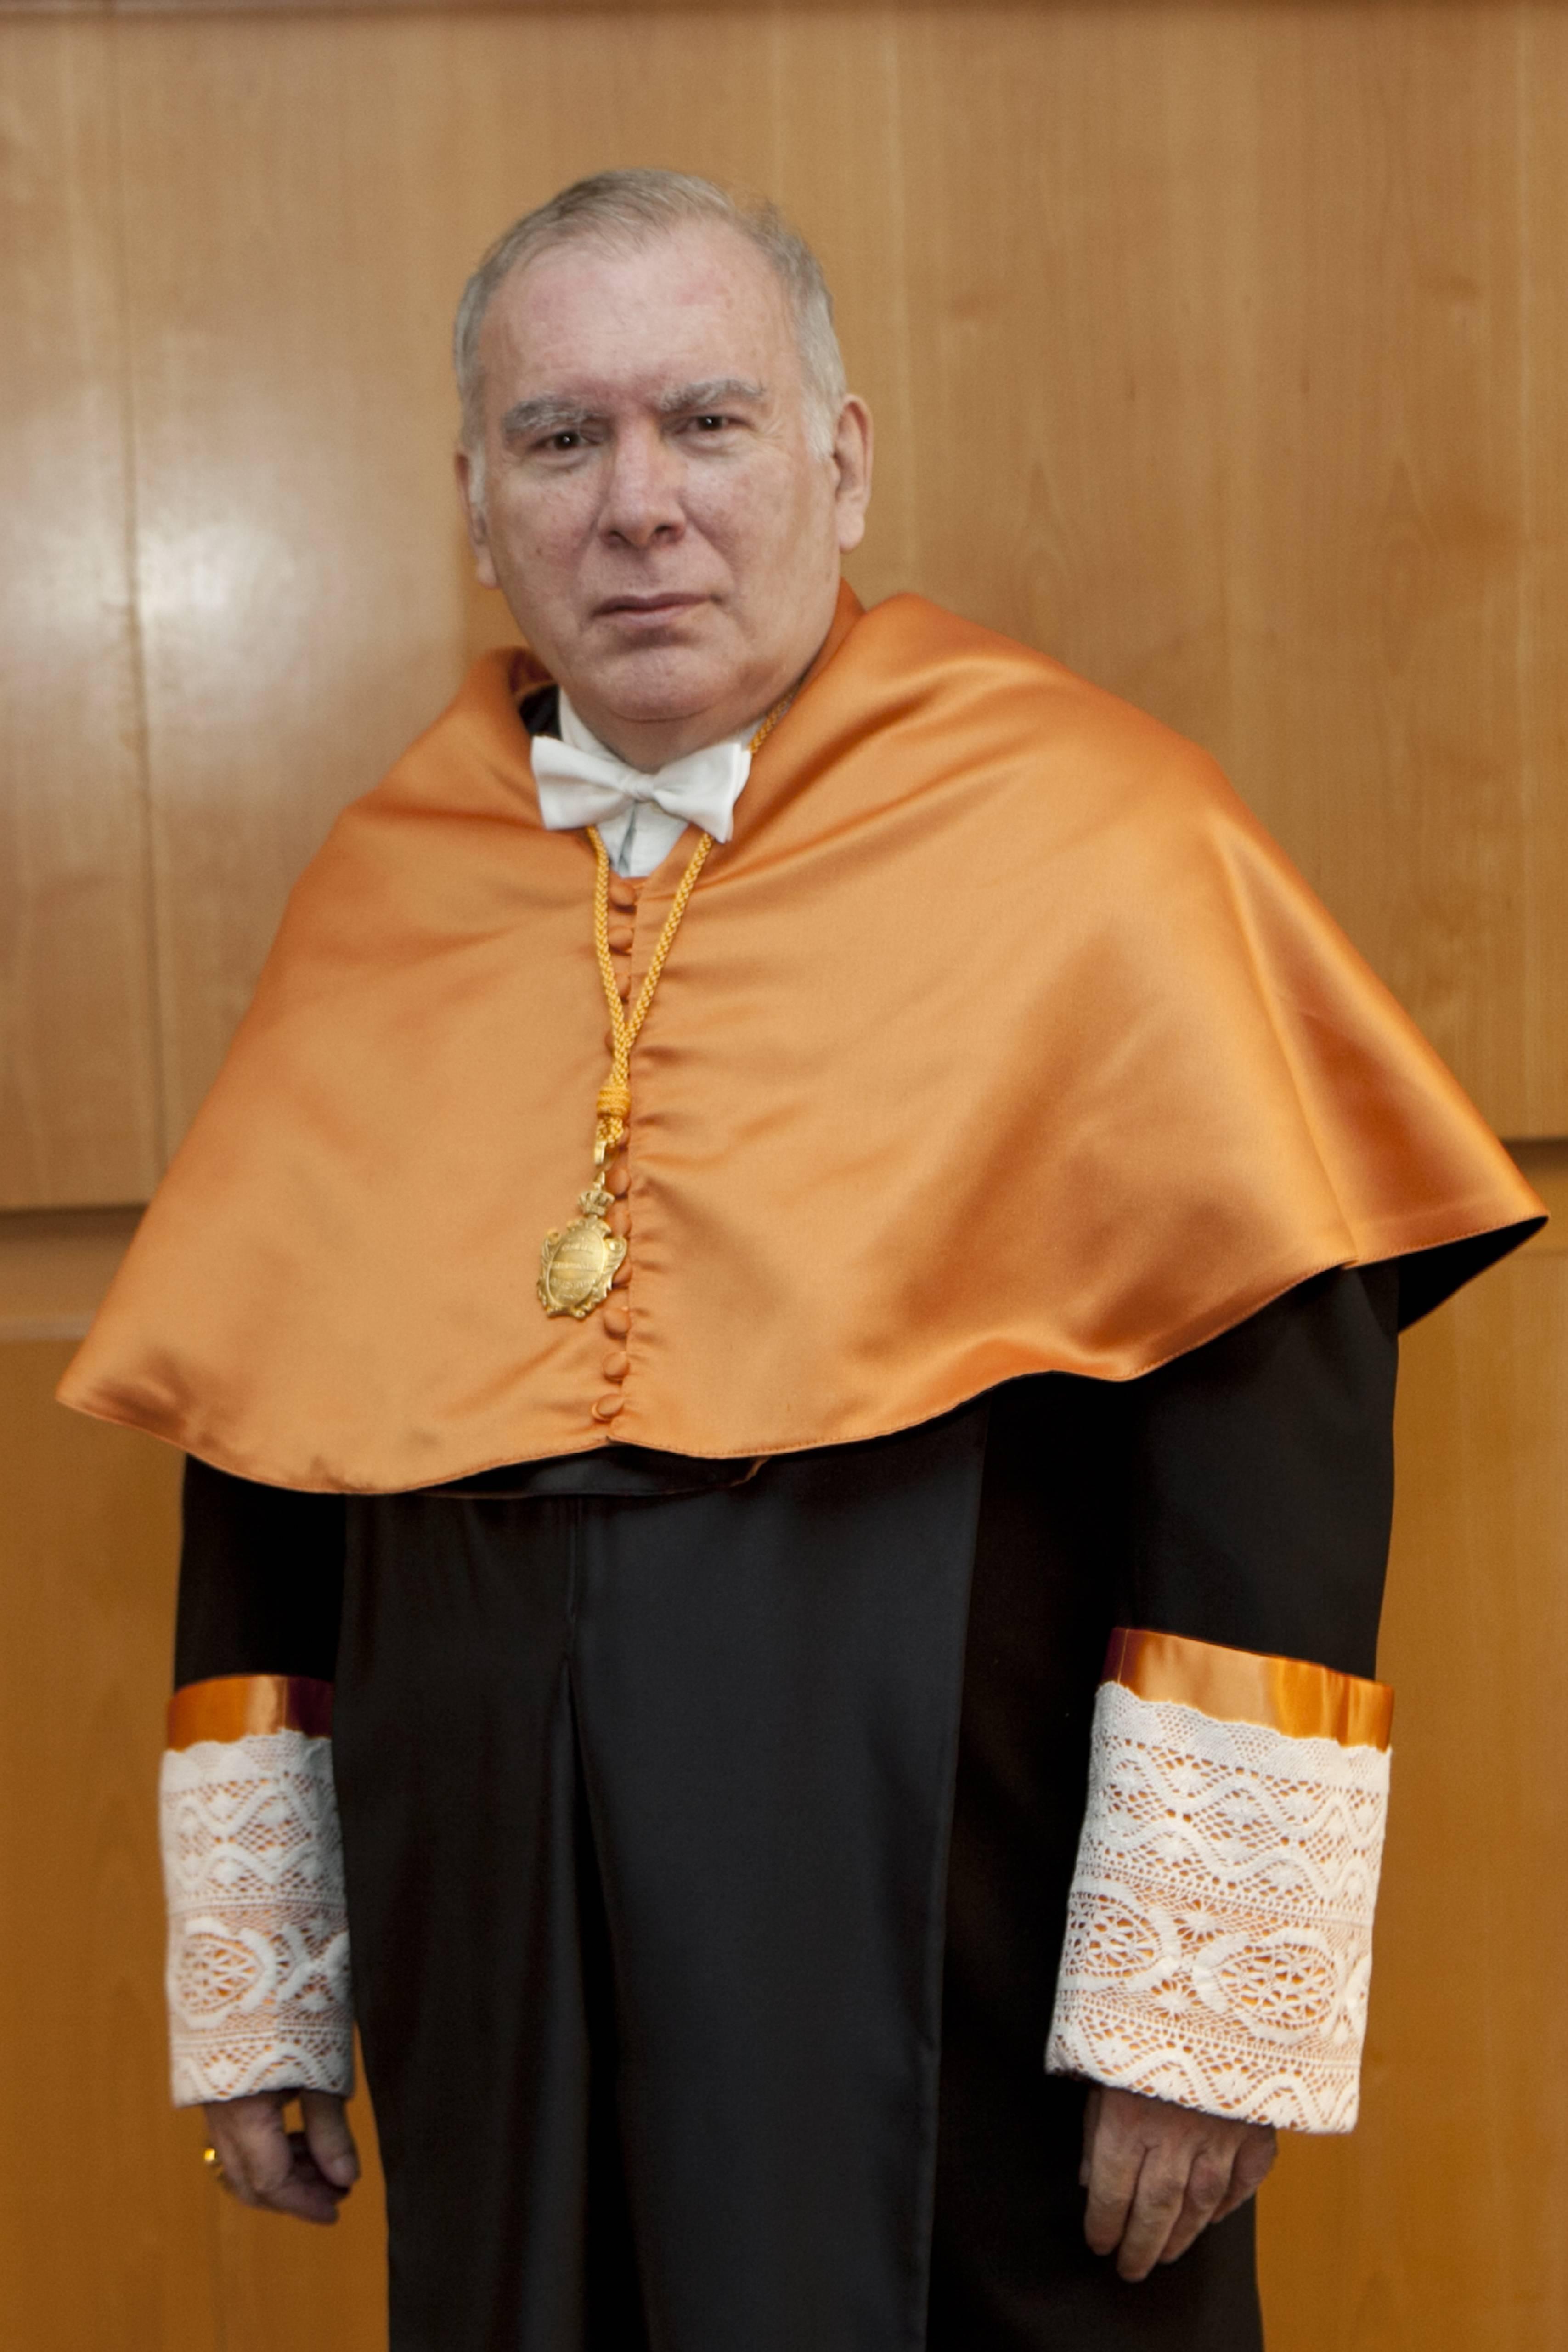 doctor-honoris-causa-luis-gamir_mg_1275.jpg